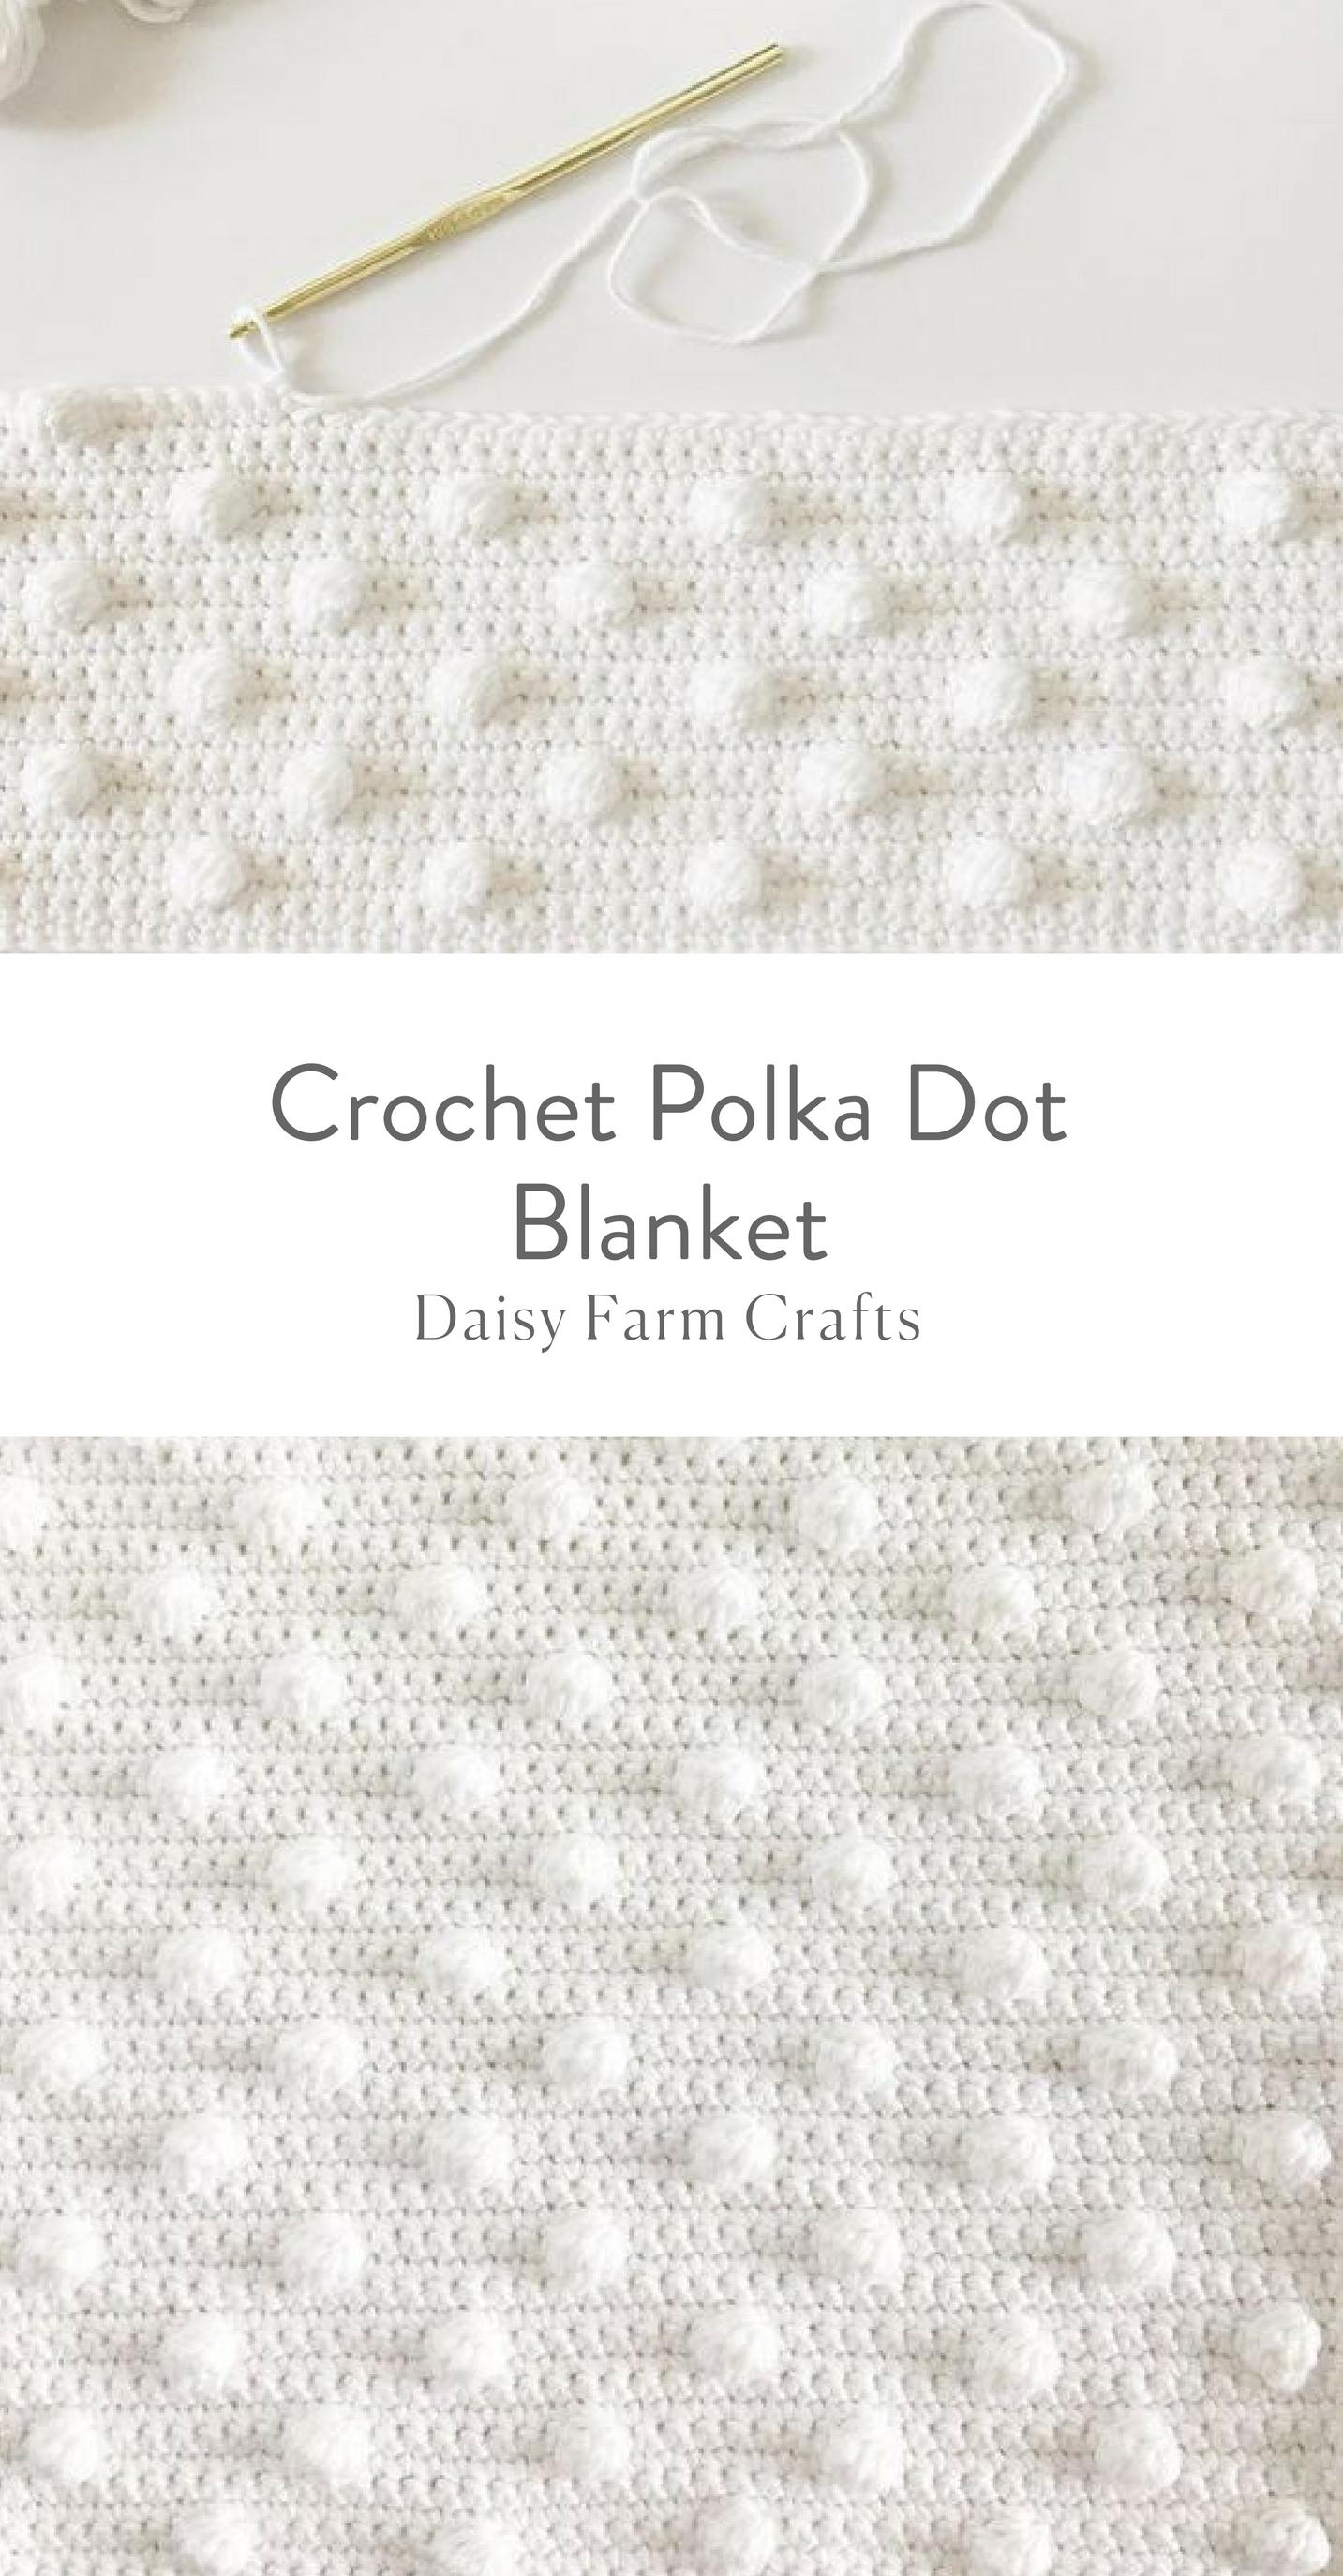 Free Pattern - Crochet Polka Dot Blanket   Yarn Crafts   Pinterest ...